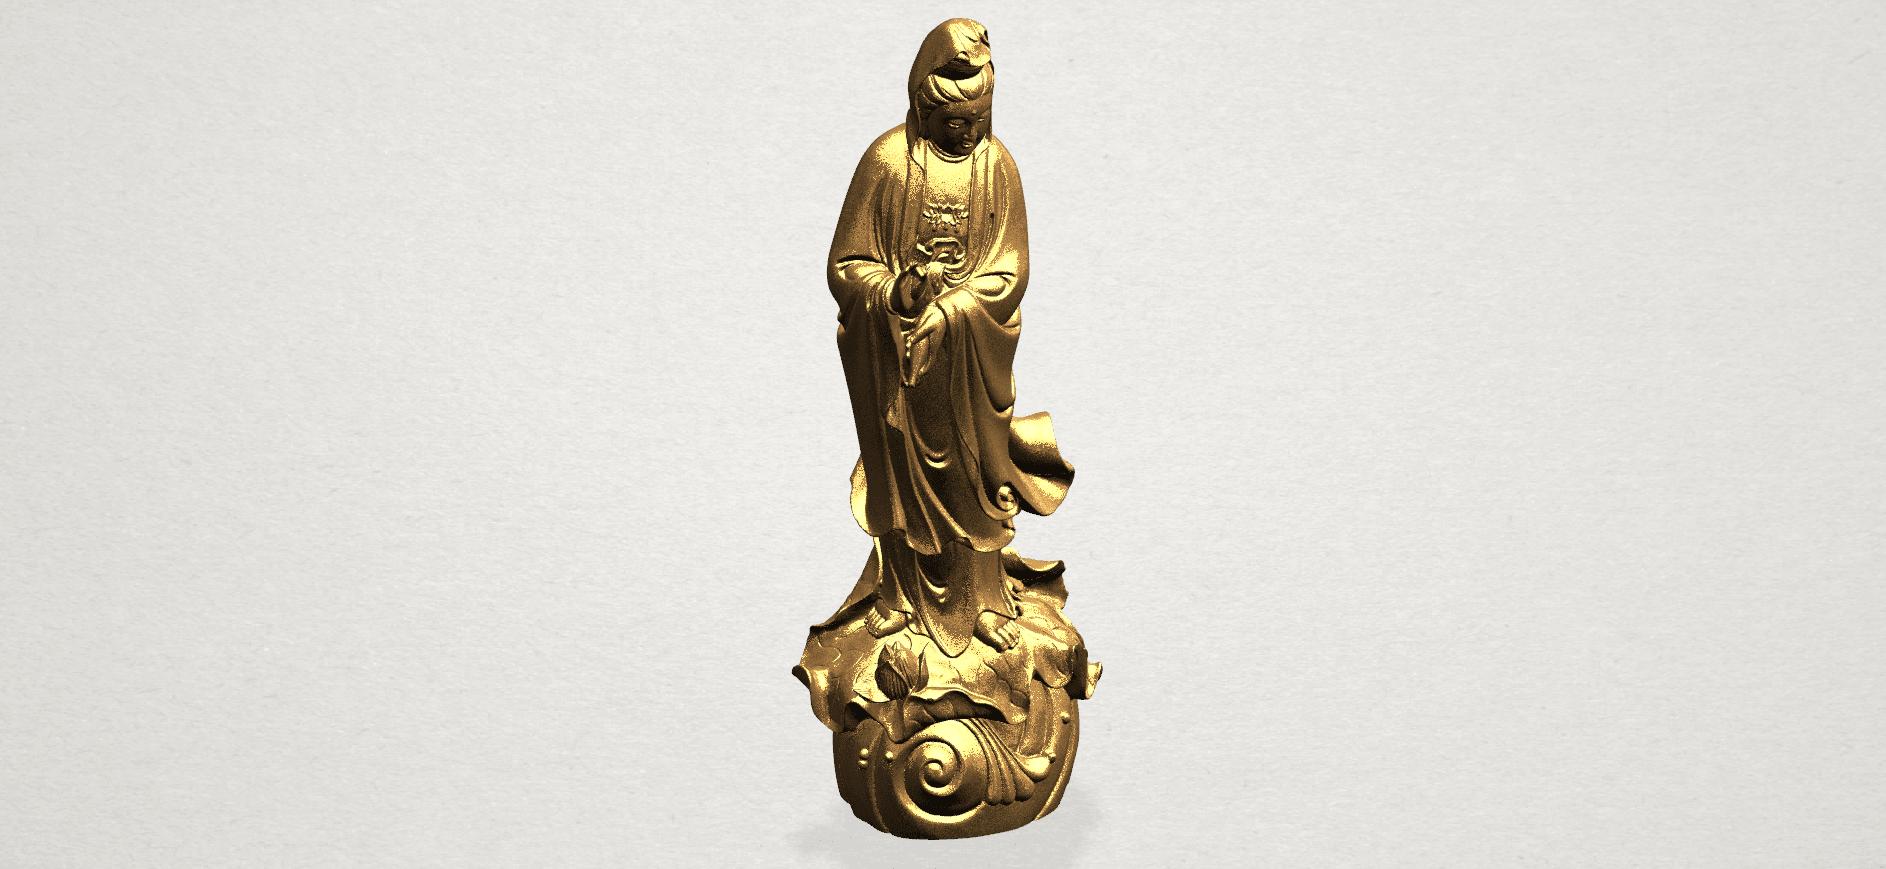 Avalokitesvara Buddha - Standing (i) A09.png Download free STL file Avalokitesvara Bodhisattva - Standing 01 • 3D printable design, GeorgesNikkei